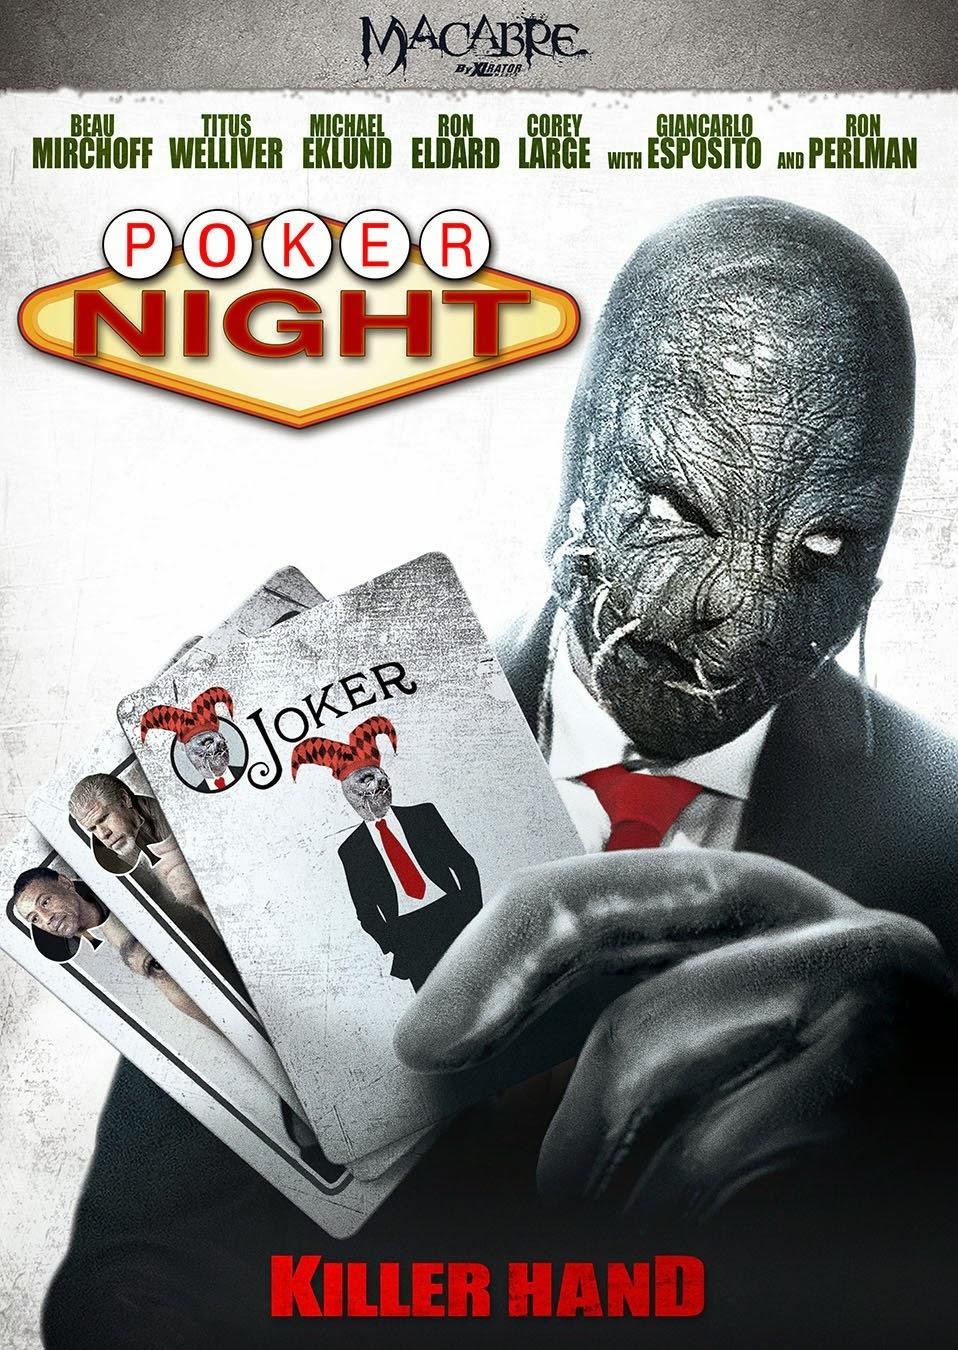 DVD Review - Poker Night